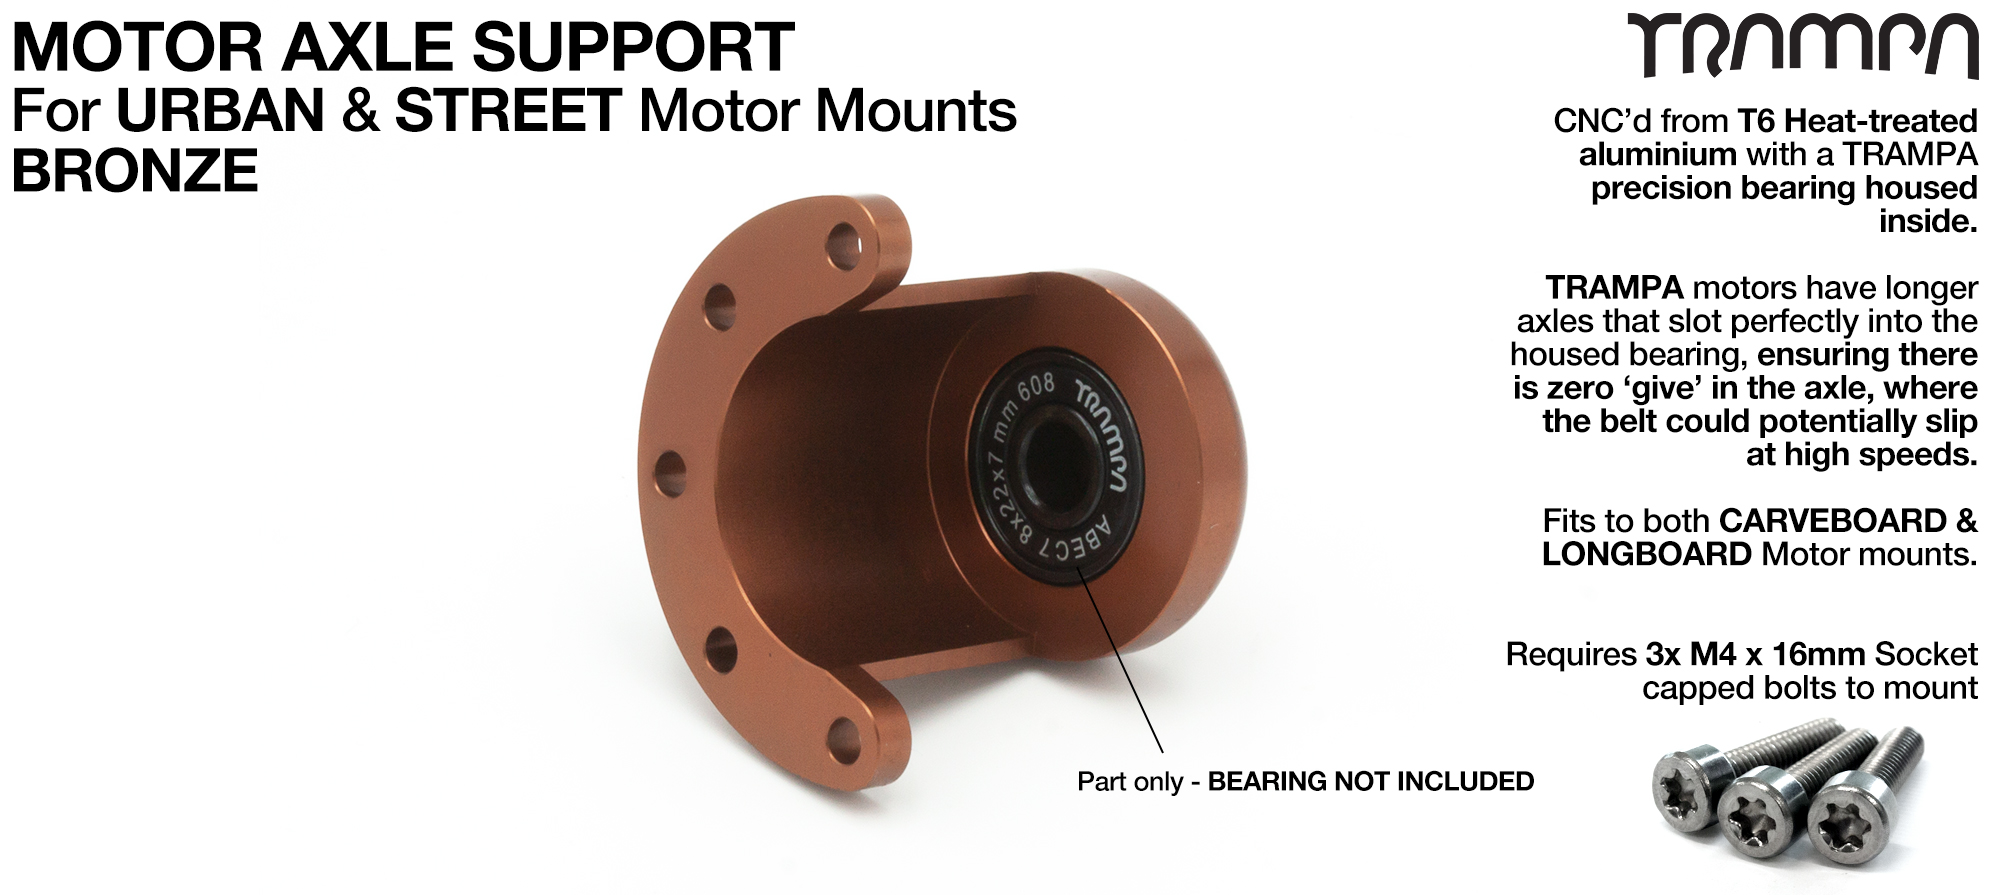 Motor Axle Support for Spring Truck Motor Mounts UNIVERSAL - BRONZE